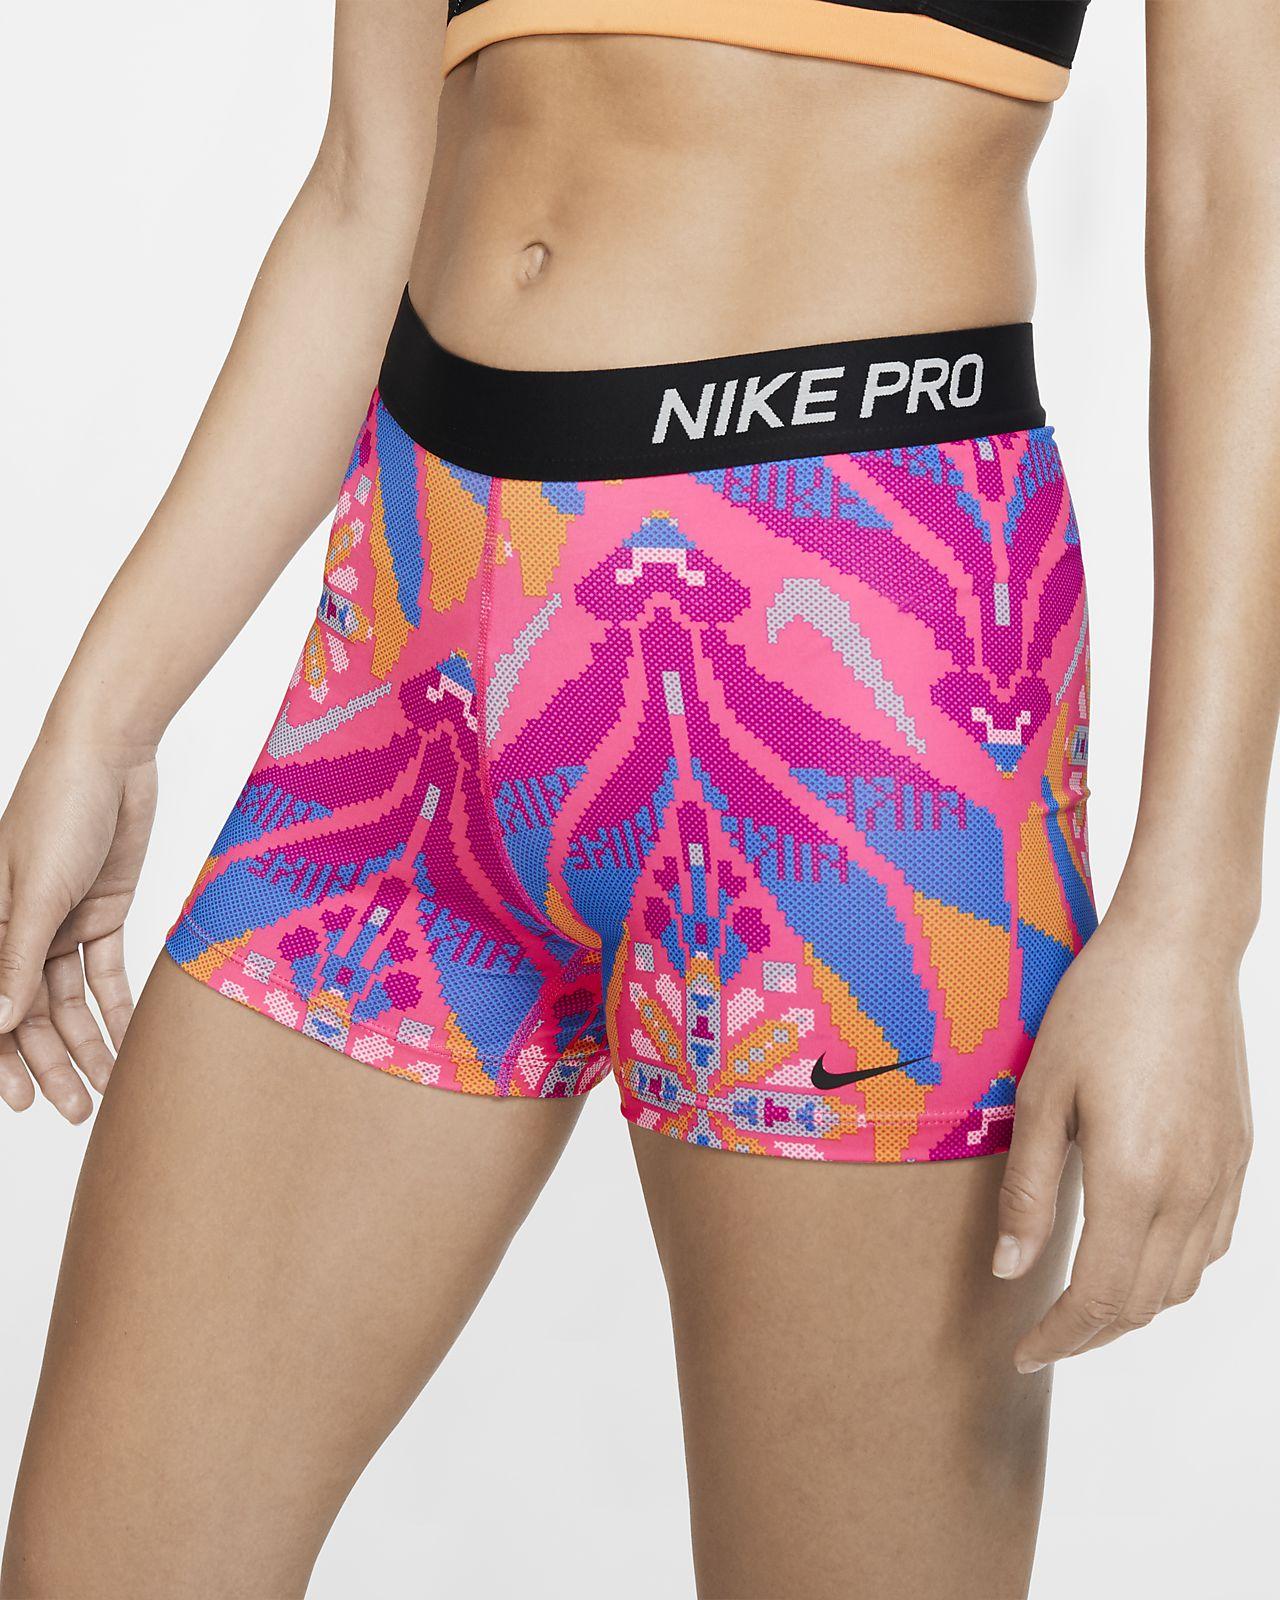 Nike Pro Damenshorts mit Print (ca. 7,5 cm)